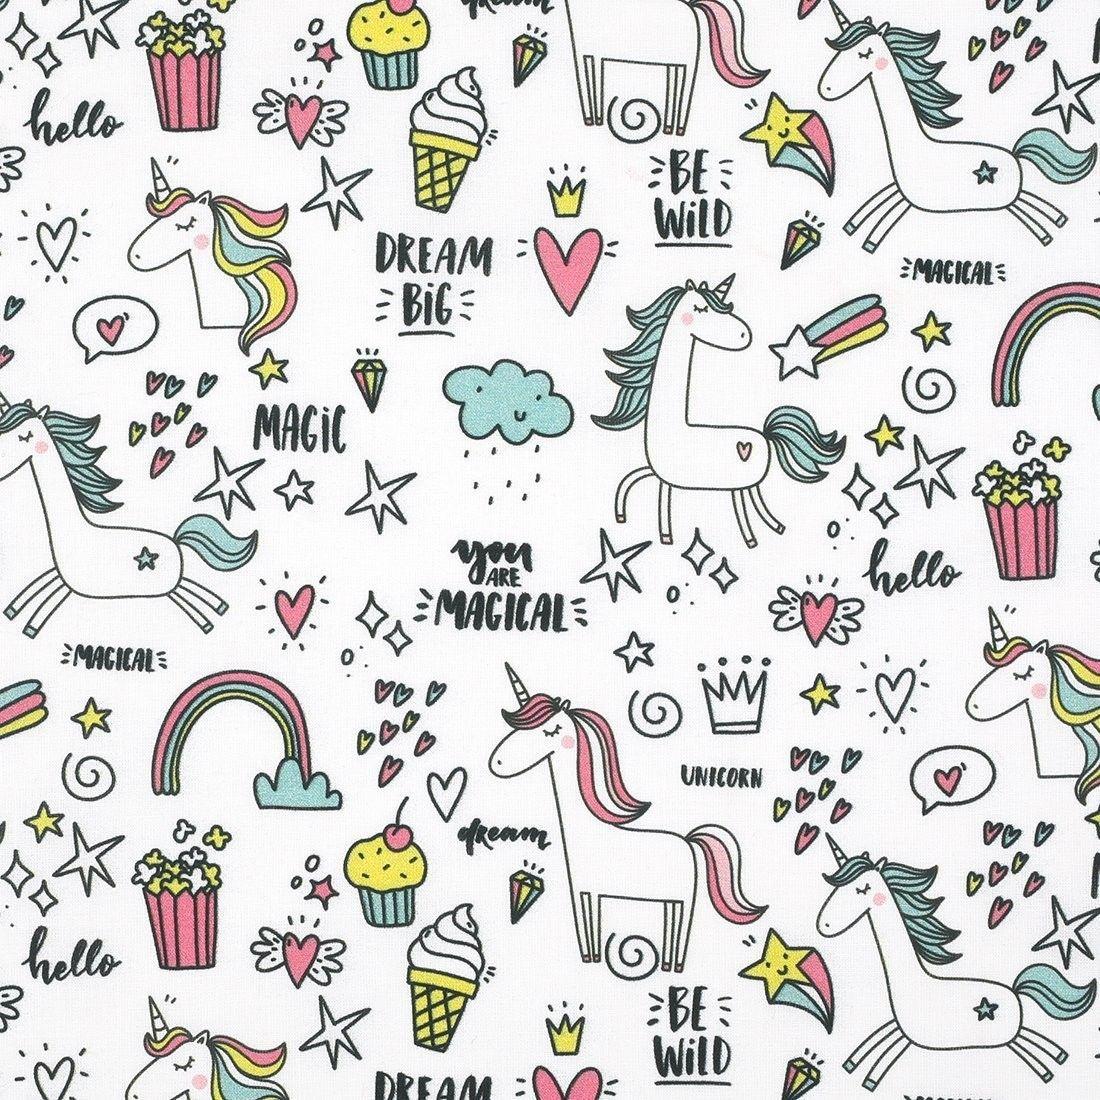 tissu coton licorne magic mondial